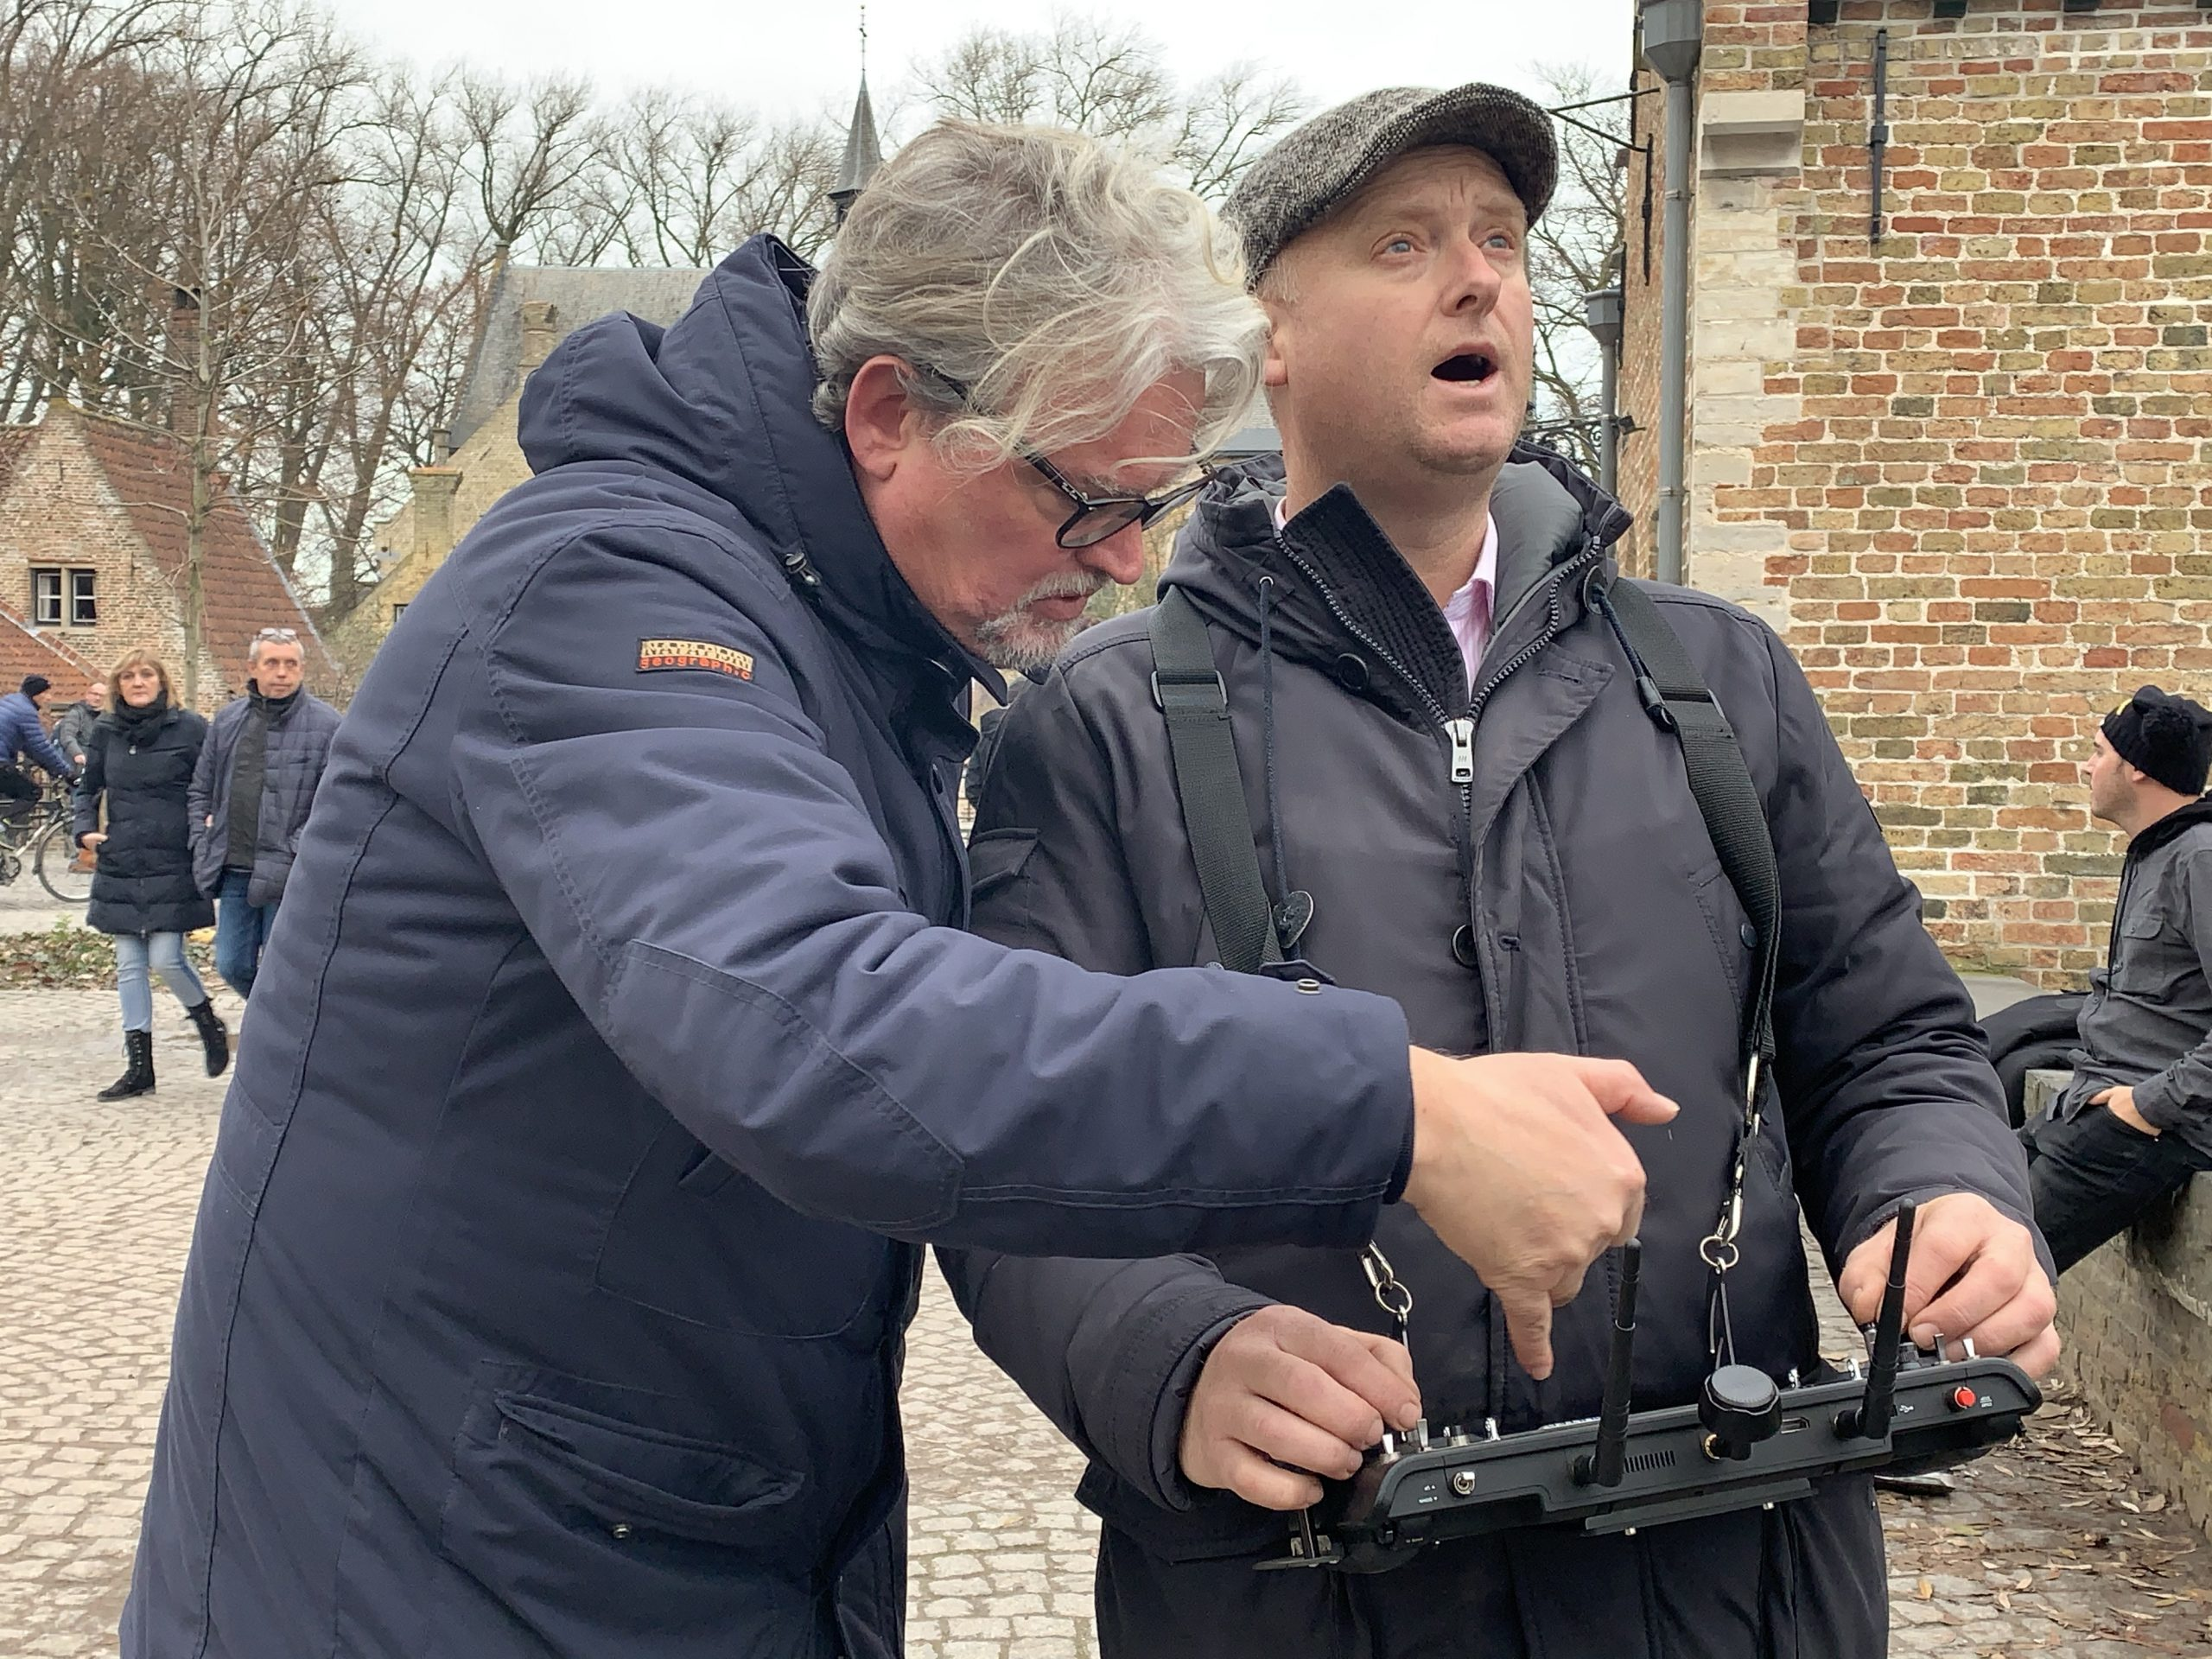 glice-brugge-drone-opname-matthias-vandendriessche-2